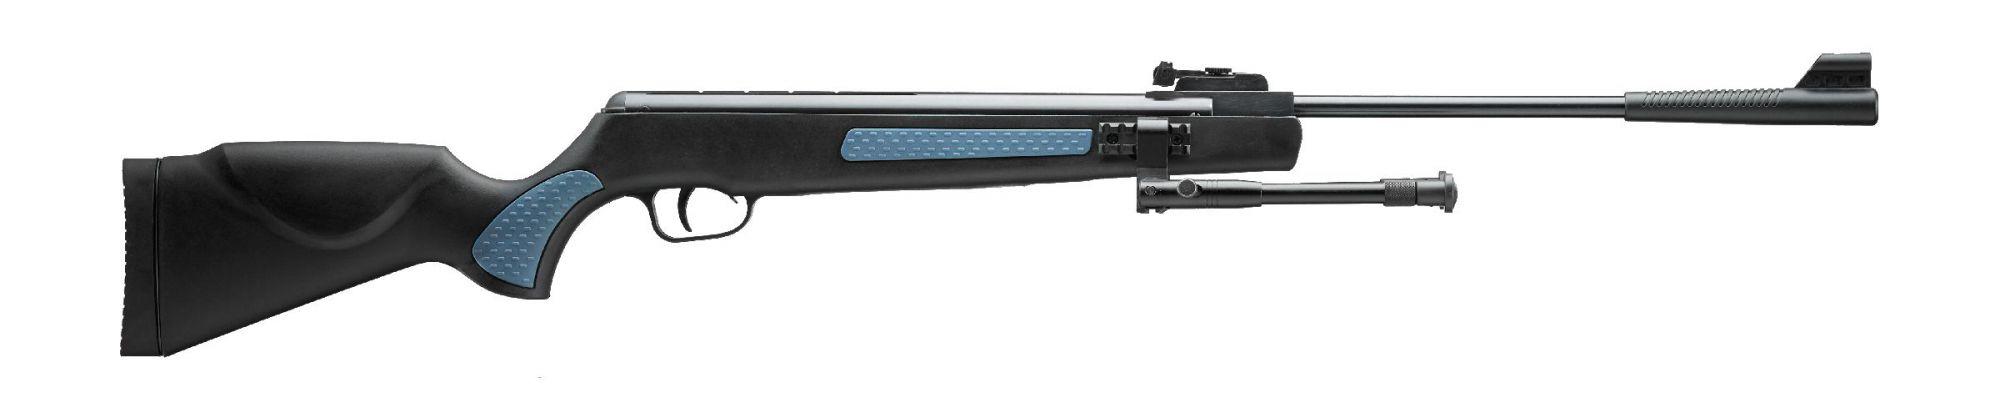 Carabine Break Barrel SR1400F ARTEMIS 4,5 mm